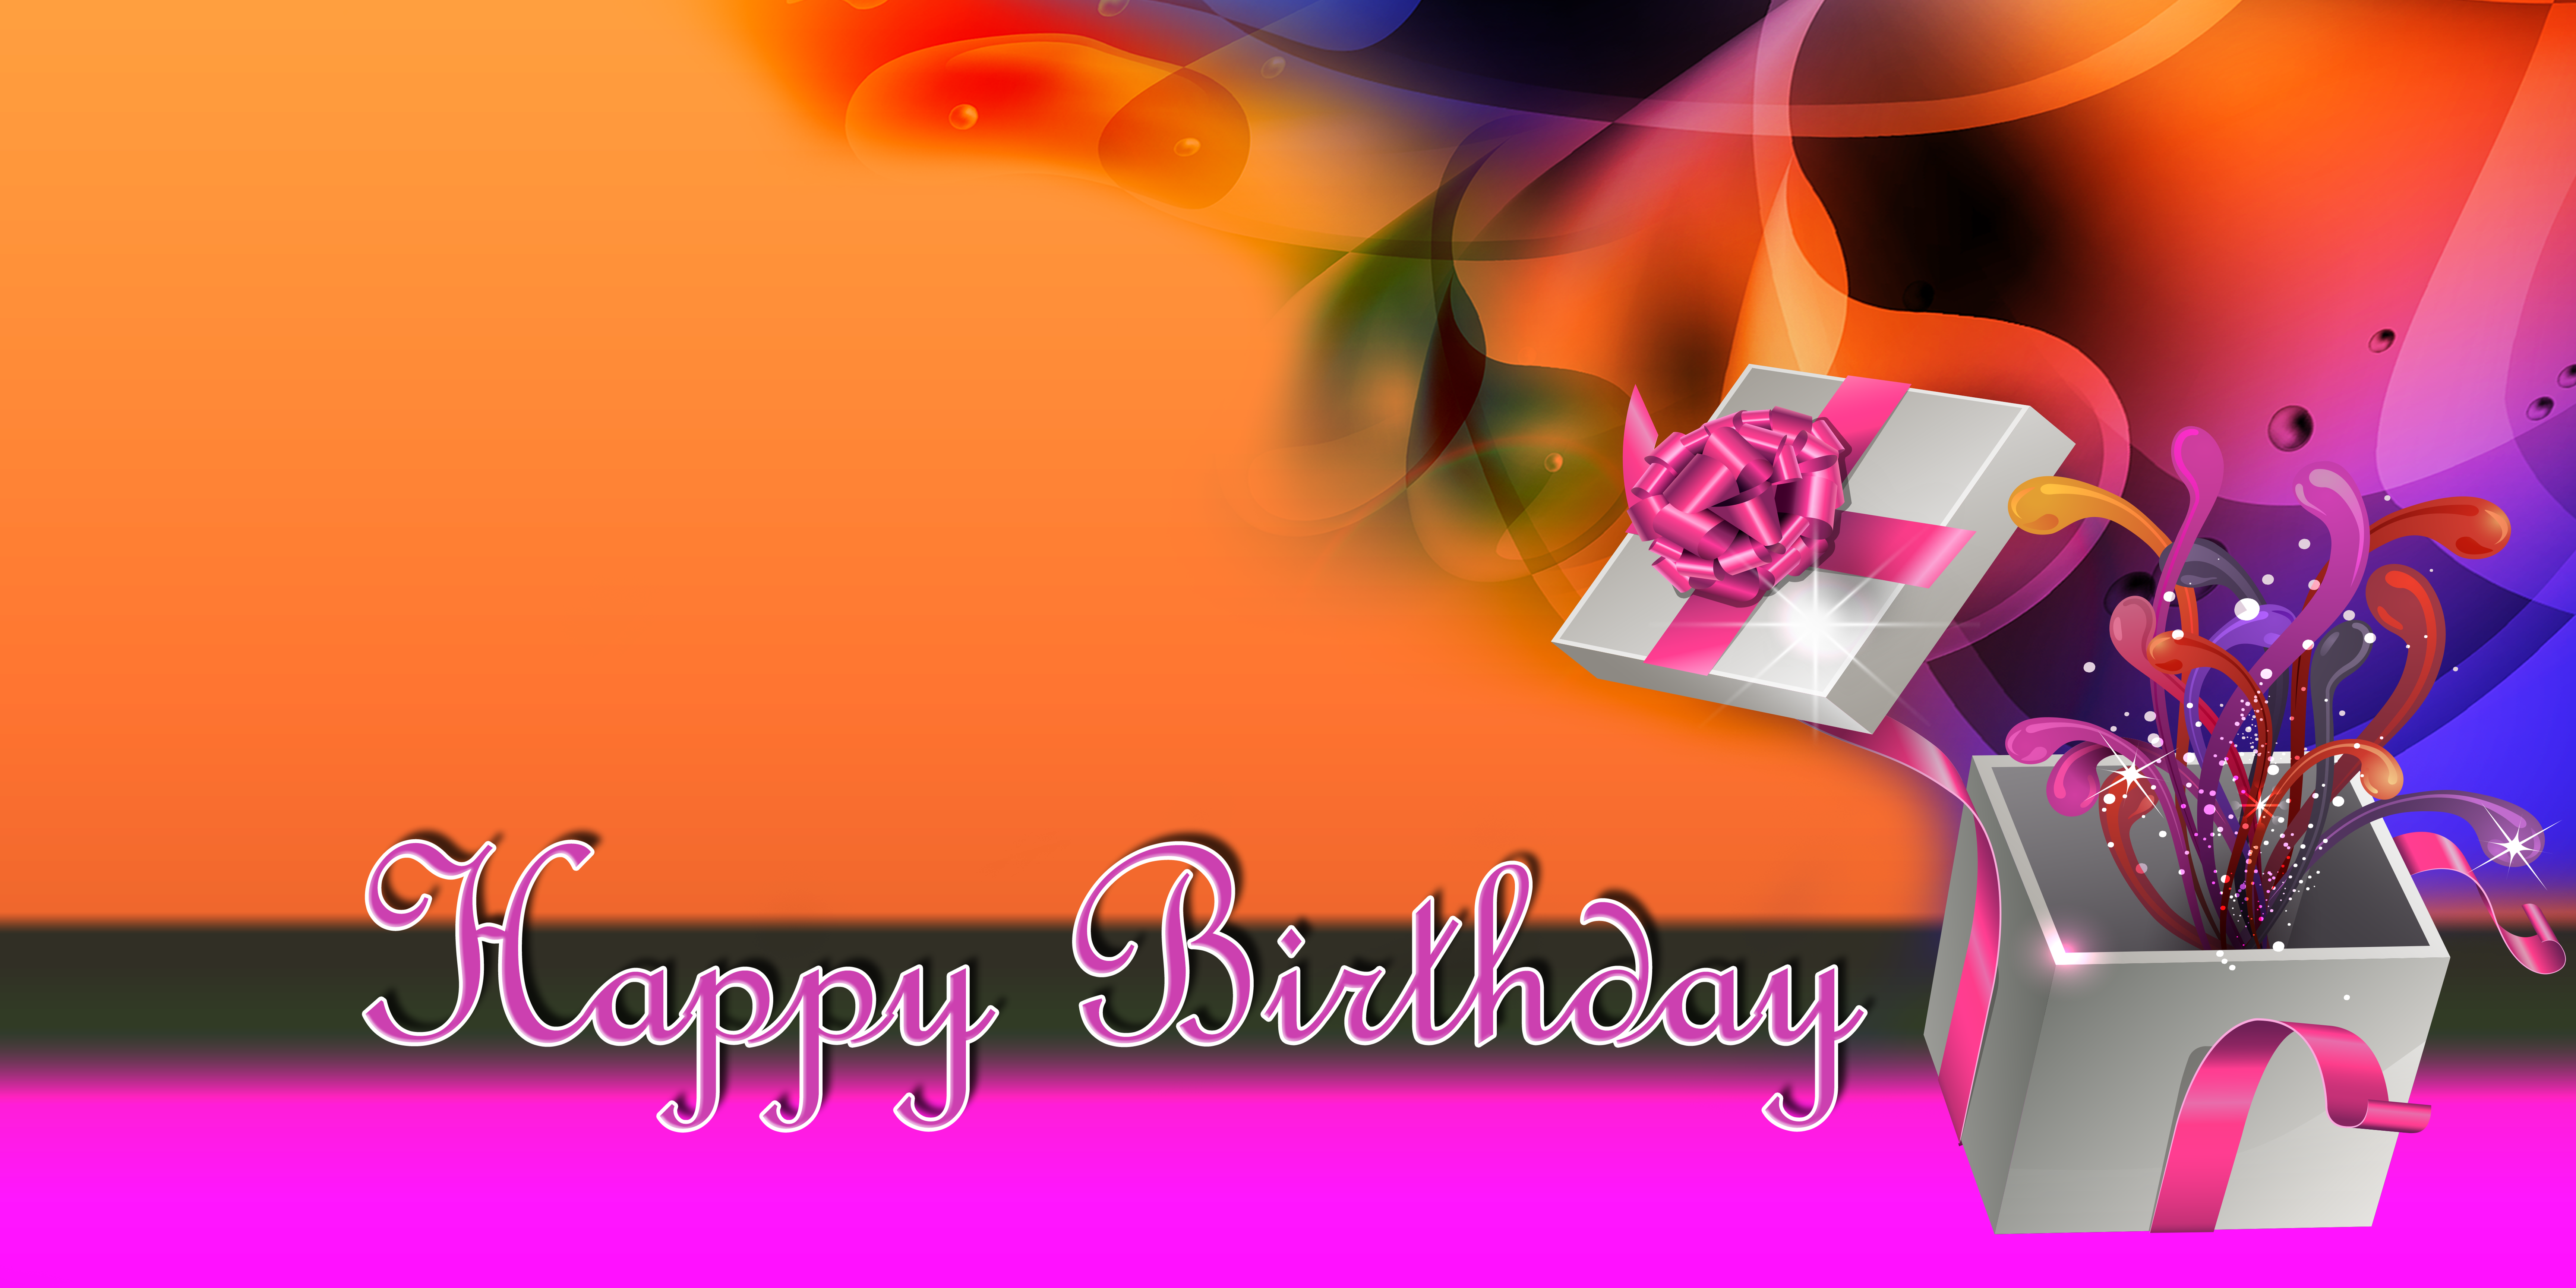 Happy Birthday Banner Pink Gift Gatorprints